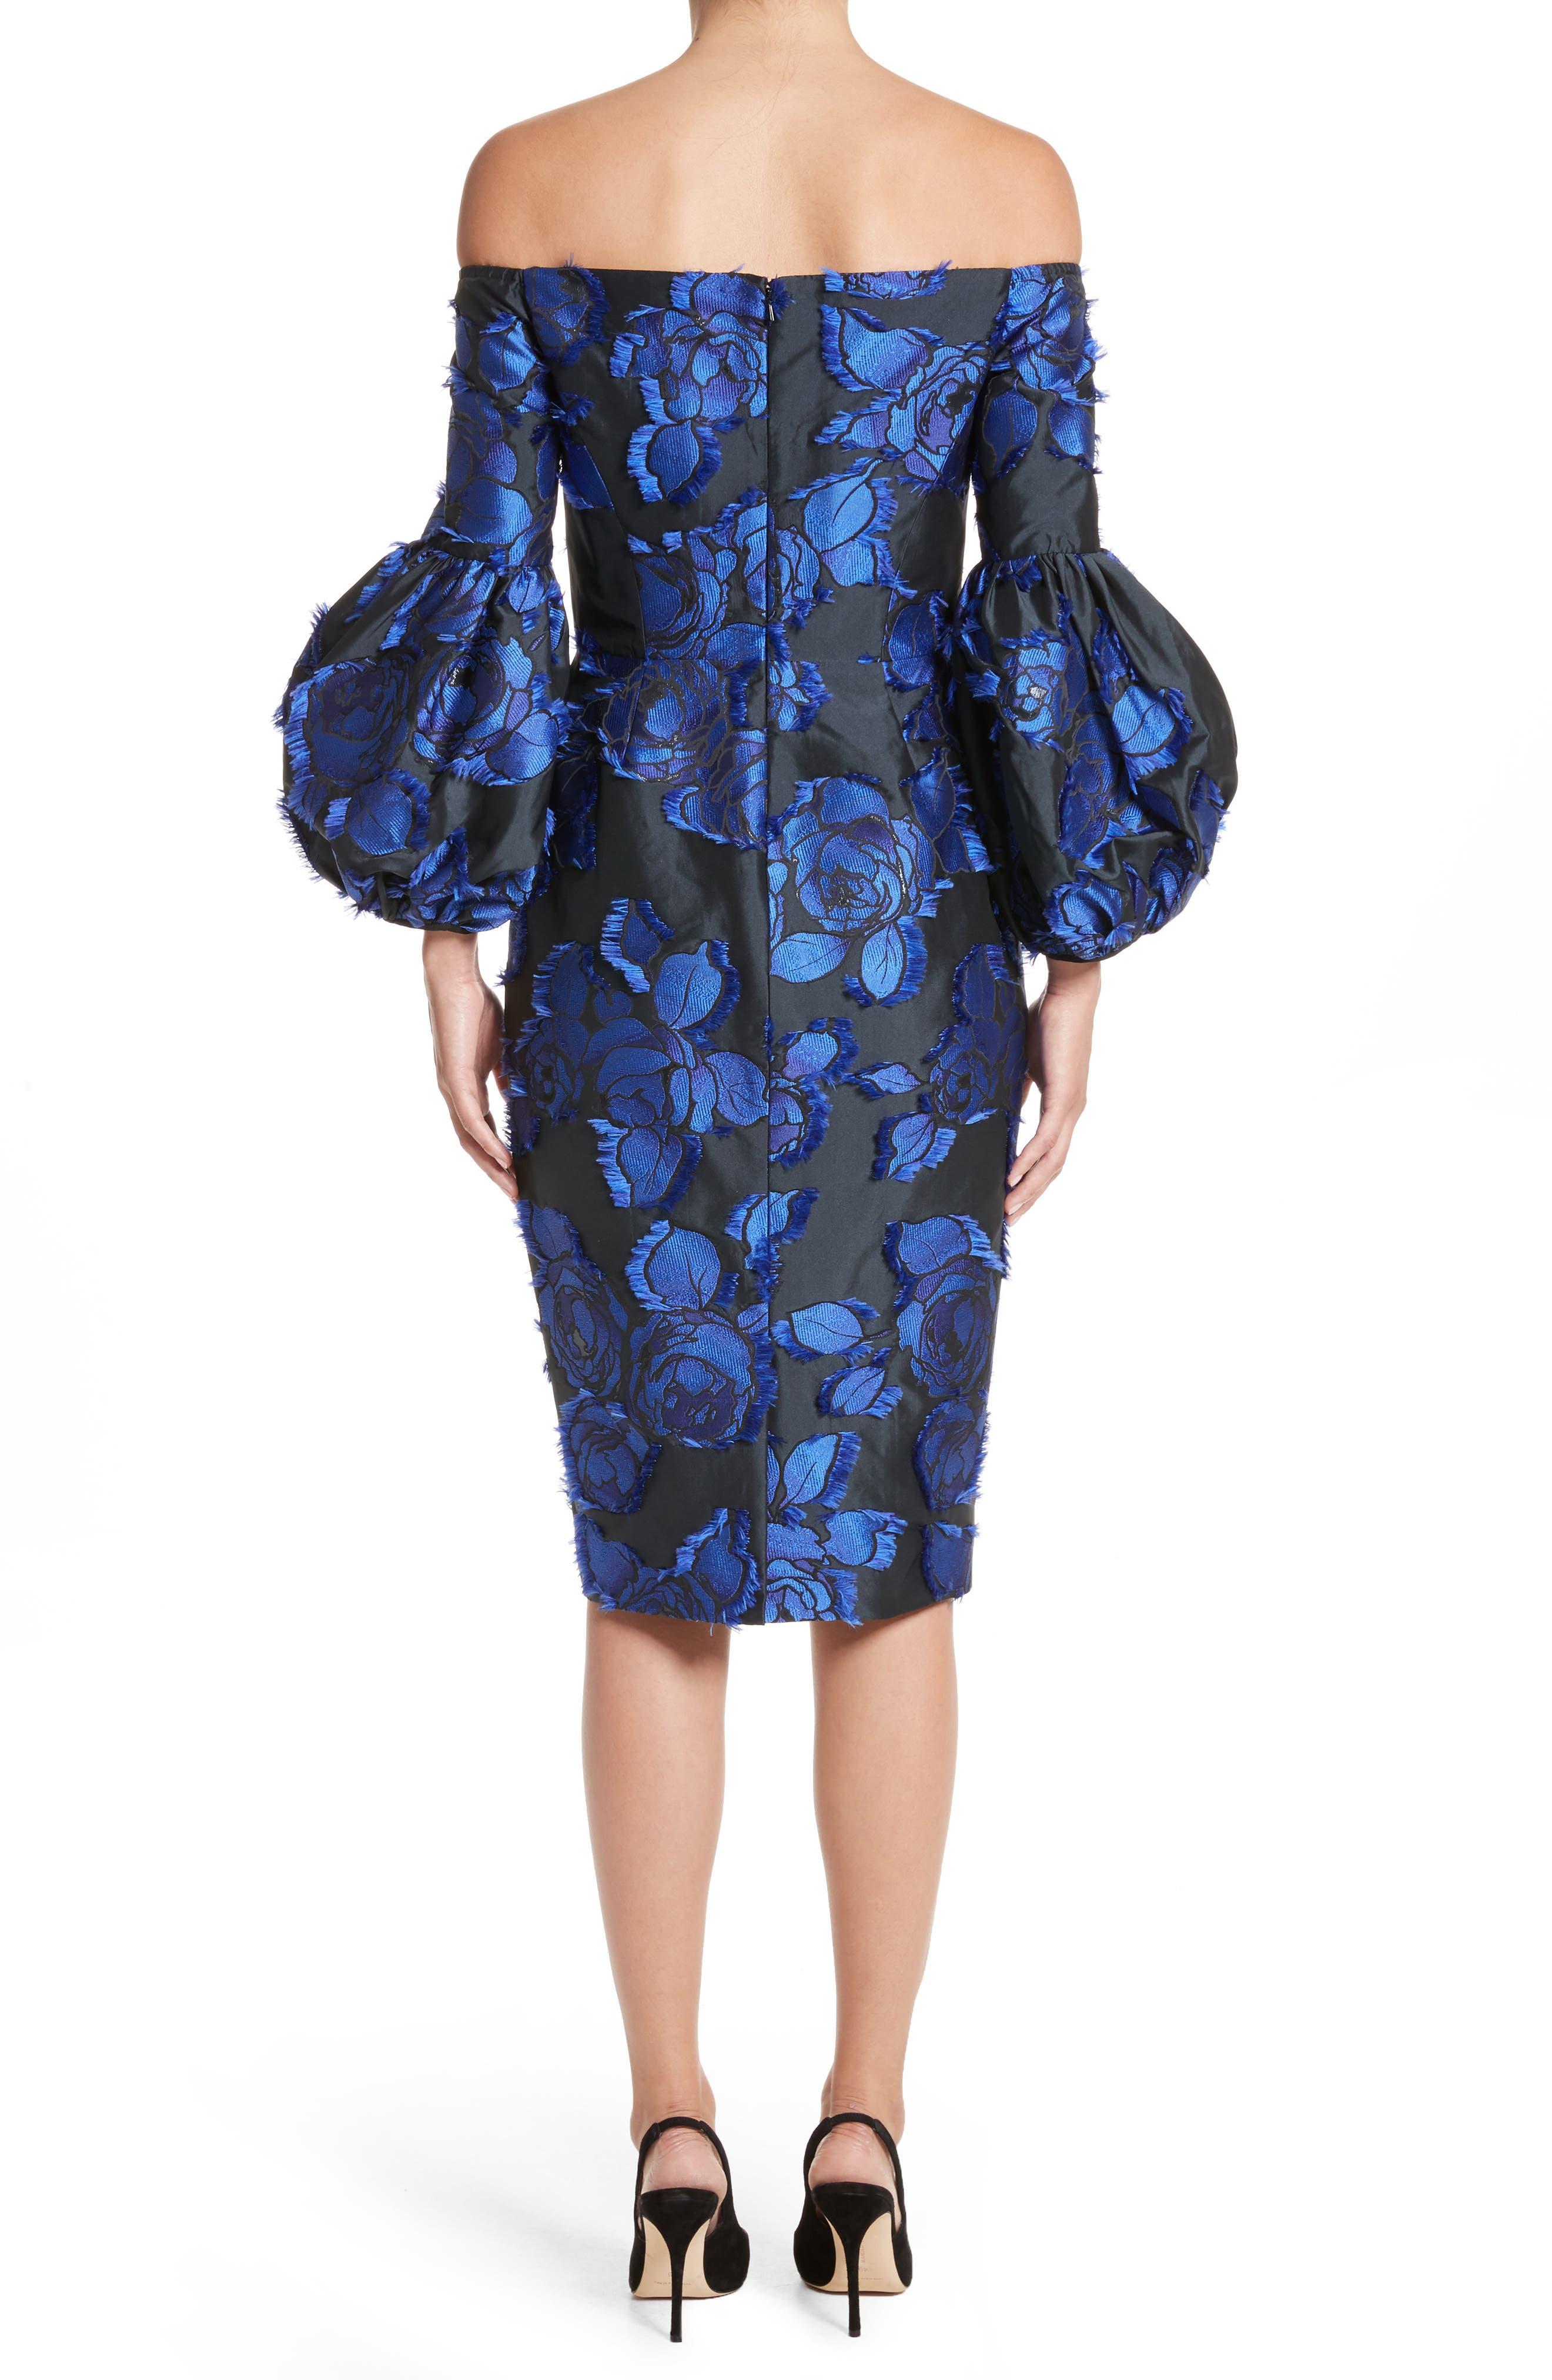 Fring Brocade Puff Sleeve Dress,                             Alternate thumbnail 2, color,                             Black/ Lapis